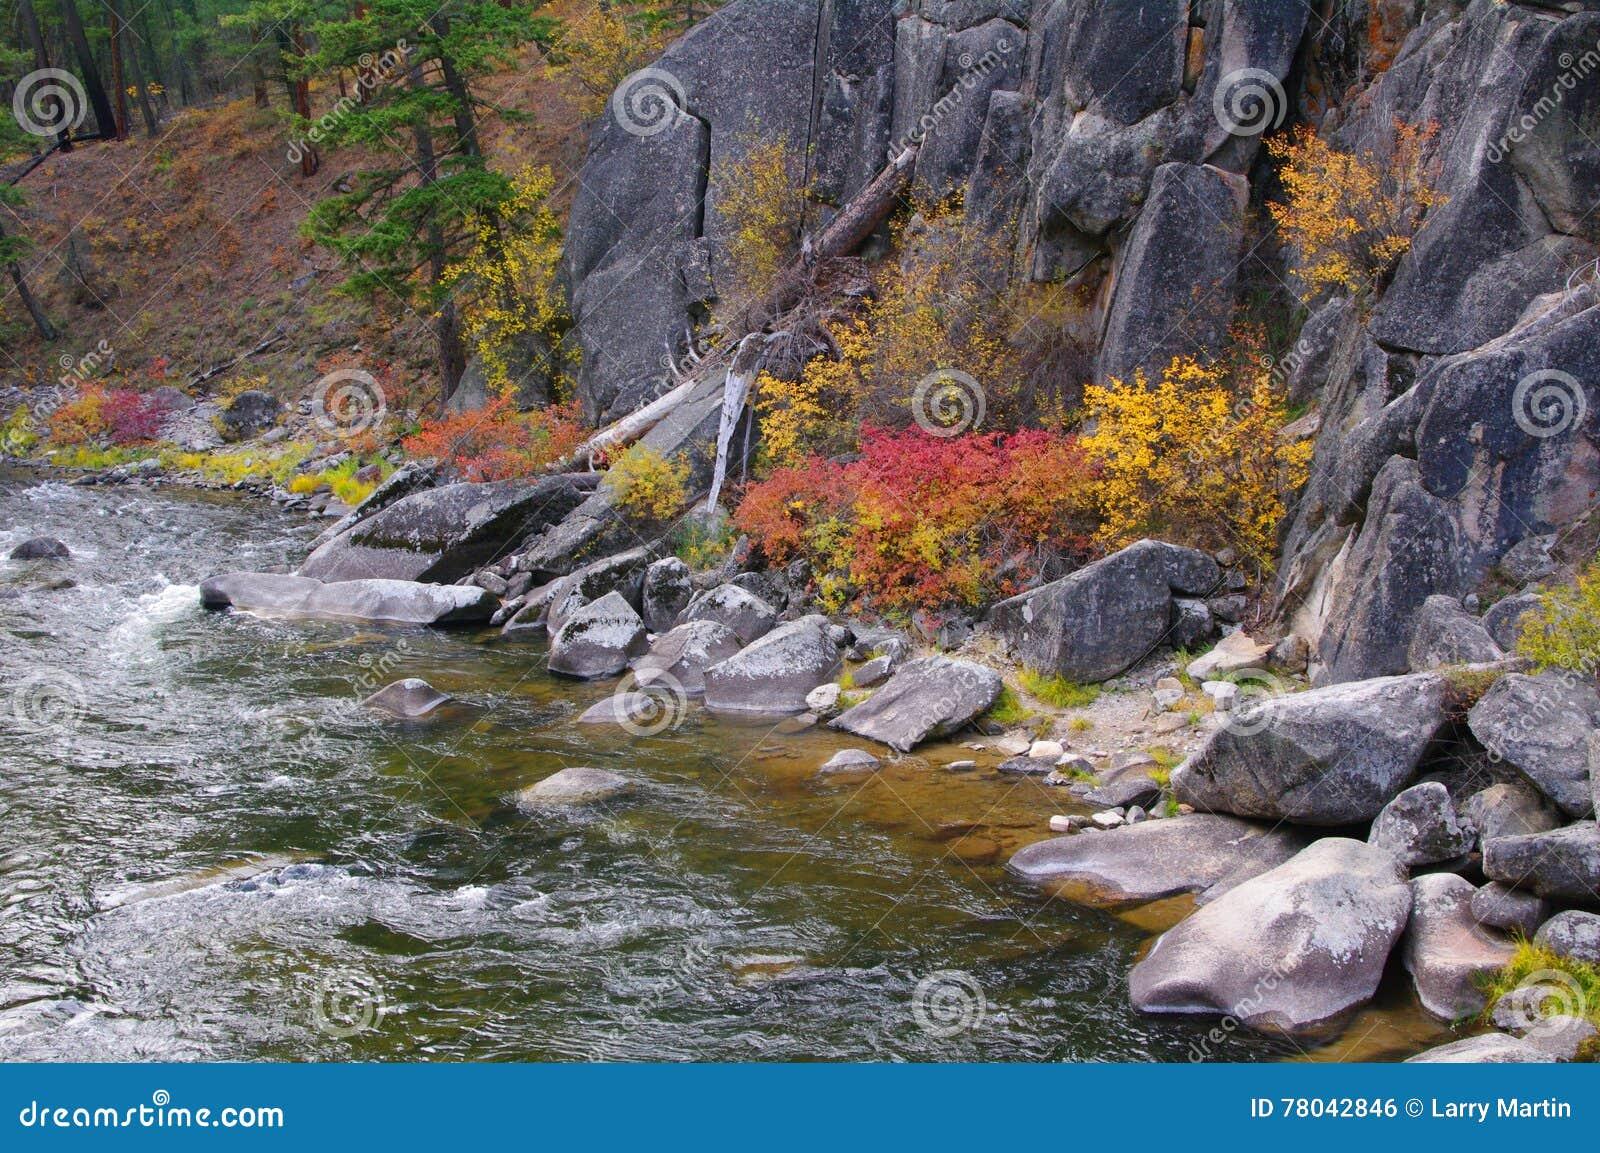 Sapphire Mountains Montana Map.Rock Creek Sapphire Mountains Stock Photo Image Of Montana Fall